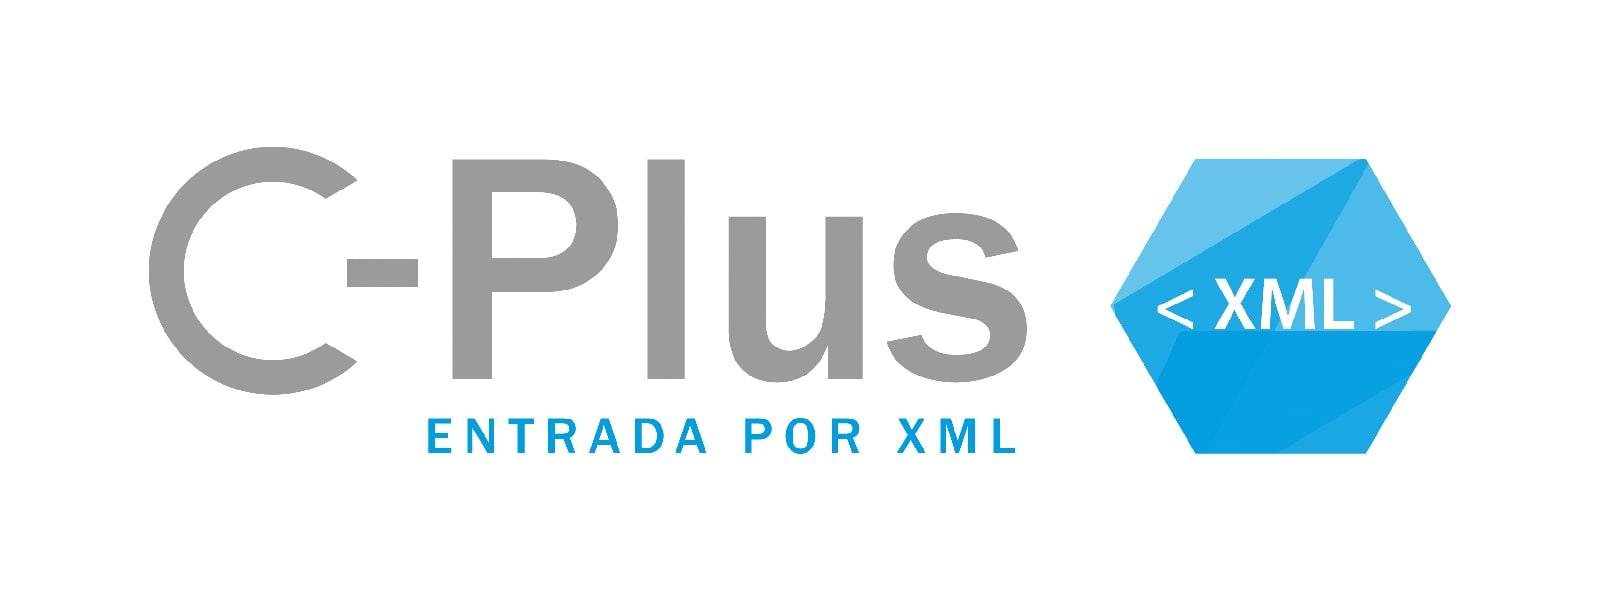 https://dllautomacao.com.br/wp-content/uploads/2018/04/Modulo-de-entrada-por-XML-1.jpg